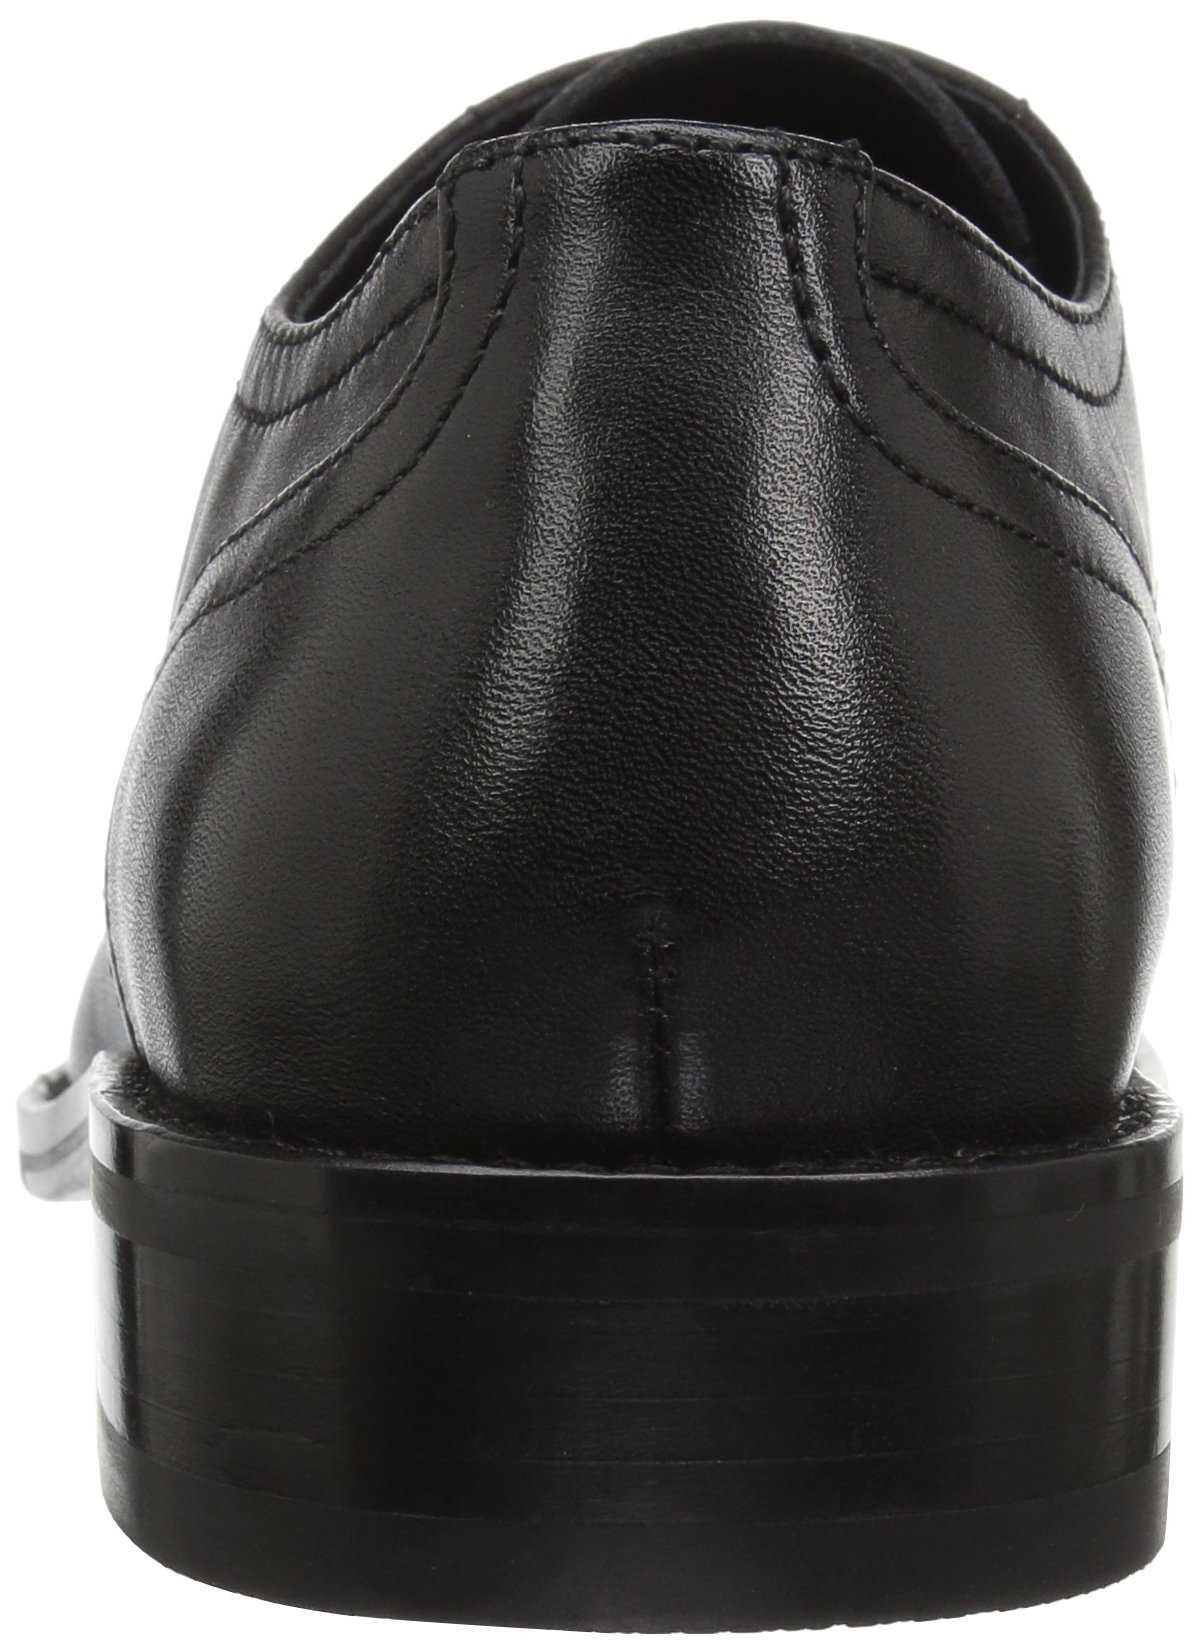 206 Collective Men's Concord Plain-Toe Oxford Shoe, Black, 13 2E US by 206 Collective (Image #2)